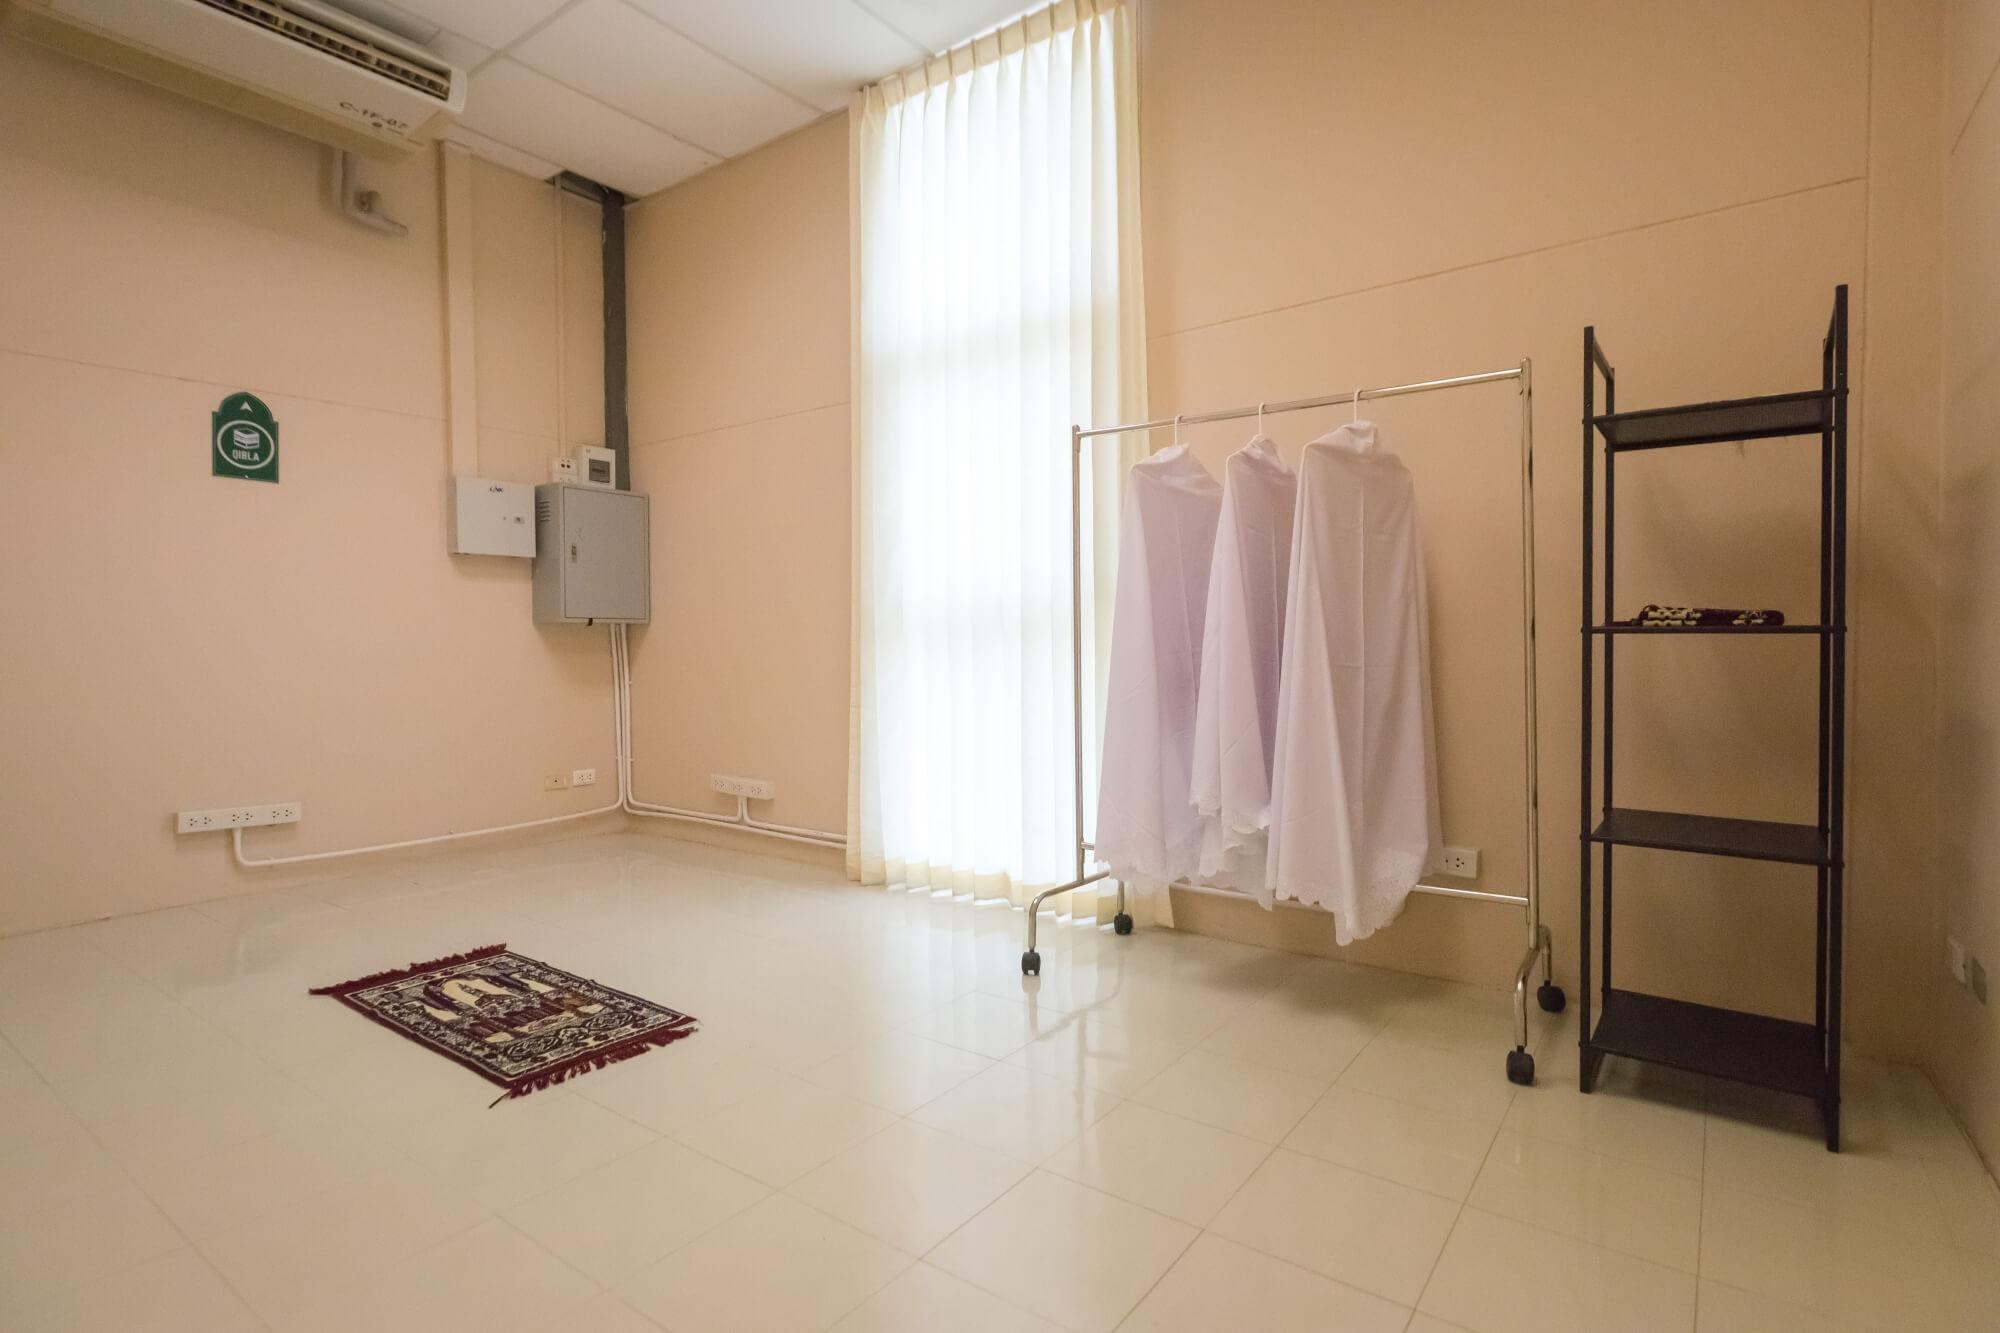 Prayer room 2 ICC HATYAI ศูนย์ประชุมนานาชาติฉลองสิริราชสมบัติครบ ๖๐ ปี